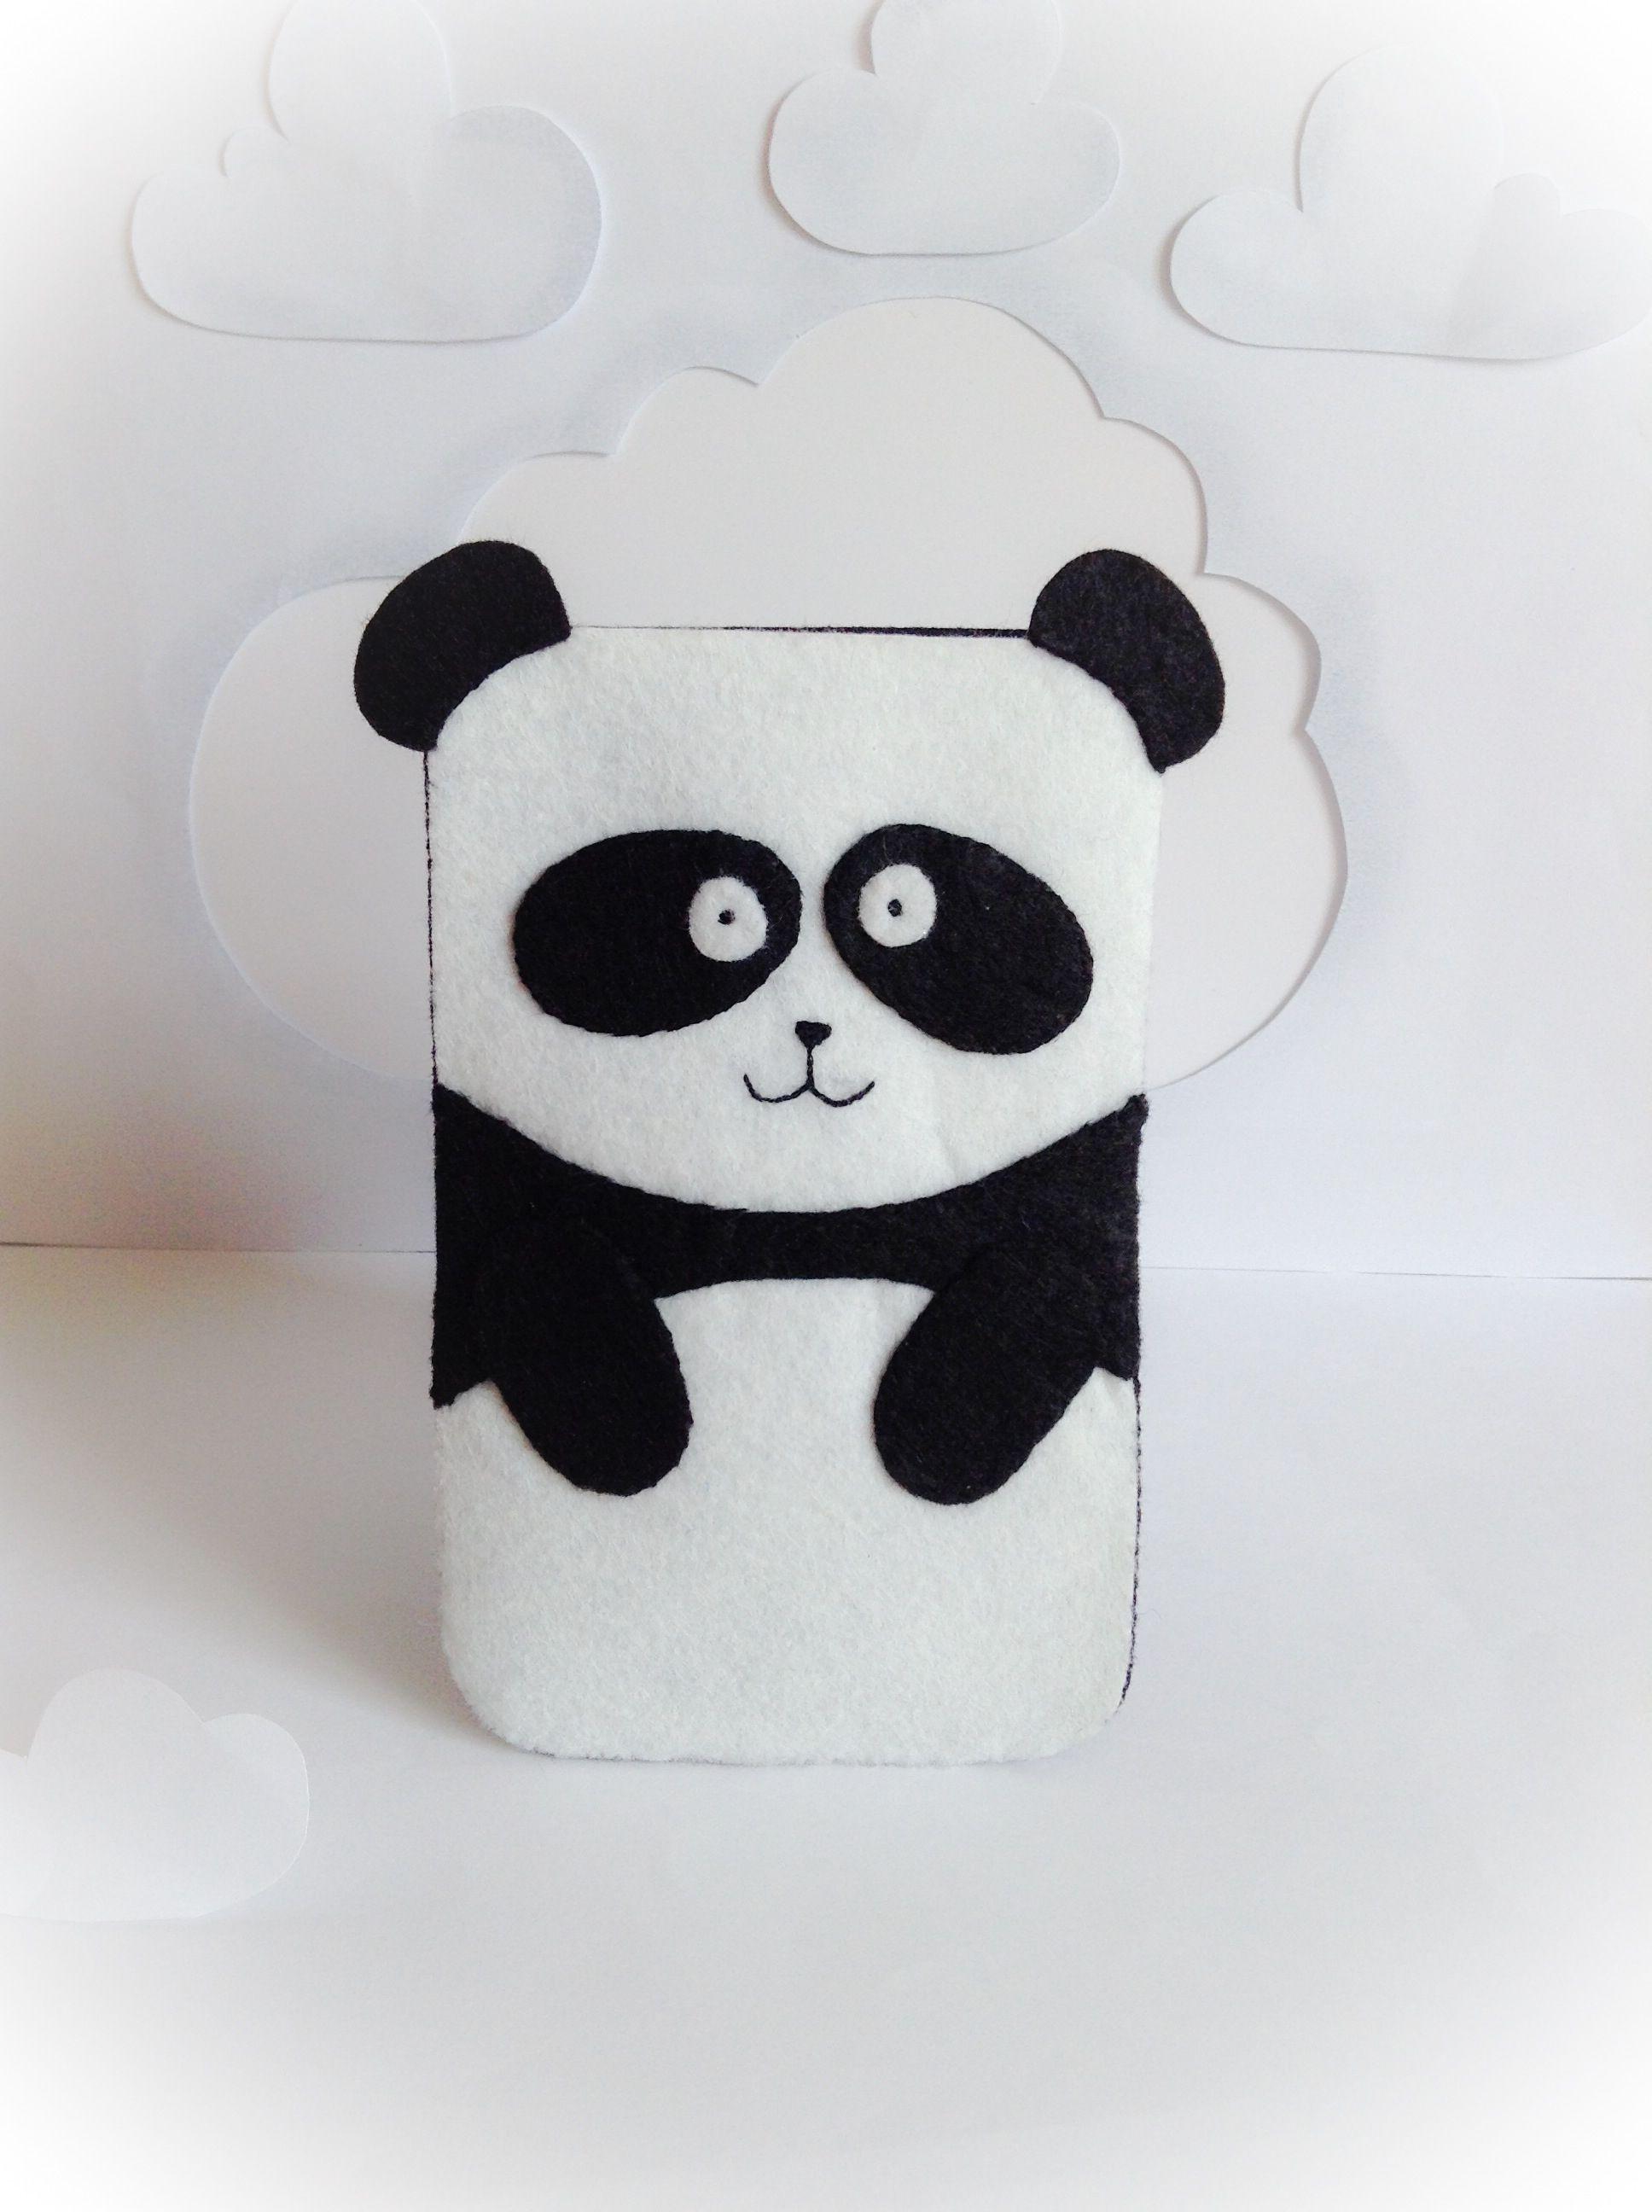 Funda de fieltro para móviles | Felt cover for mobile #bear #panda